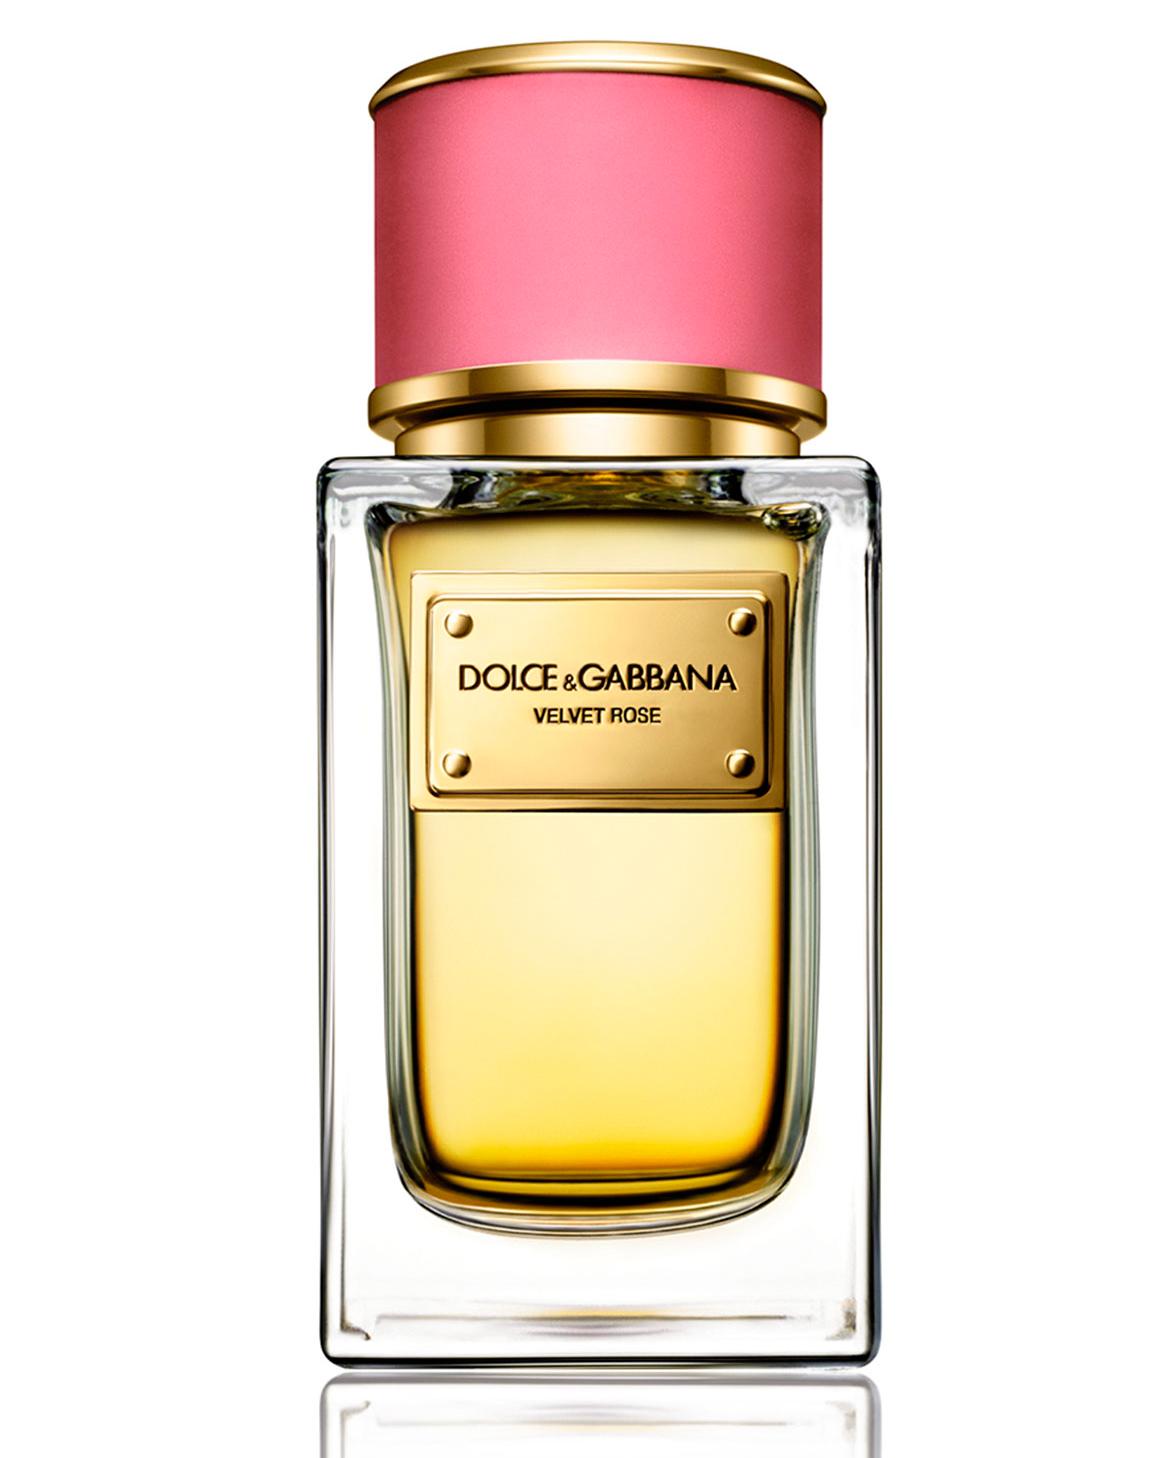 rose-perfume-dolce-gabbana-0315.jpg